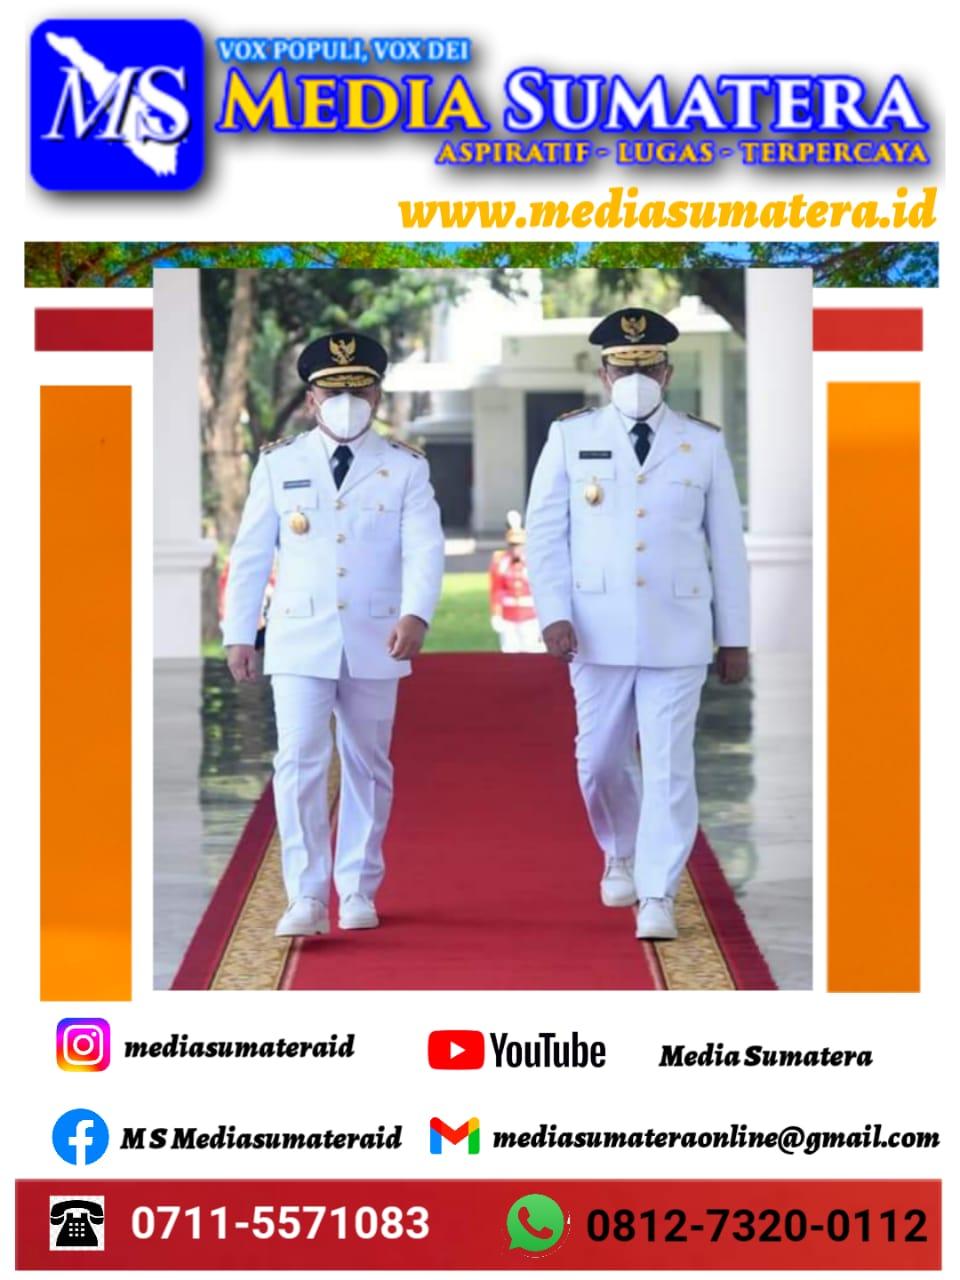 Presiden Joko Widodo Resmi Lantik Gubernur dan Wakil Gubernur Kalimantan Tengah Masa Jabatan 2021-2024